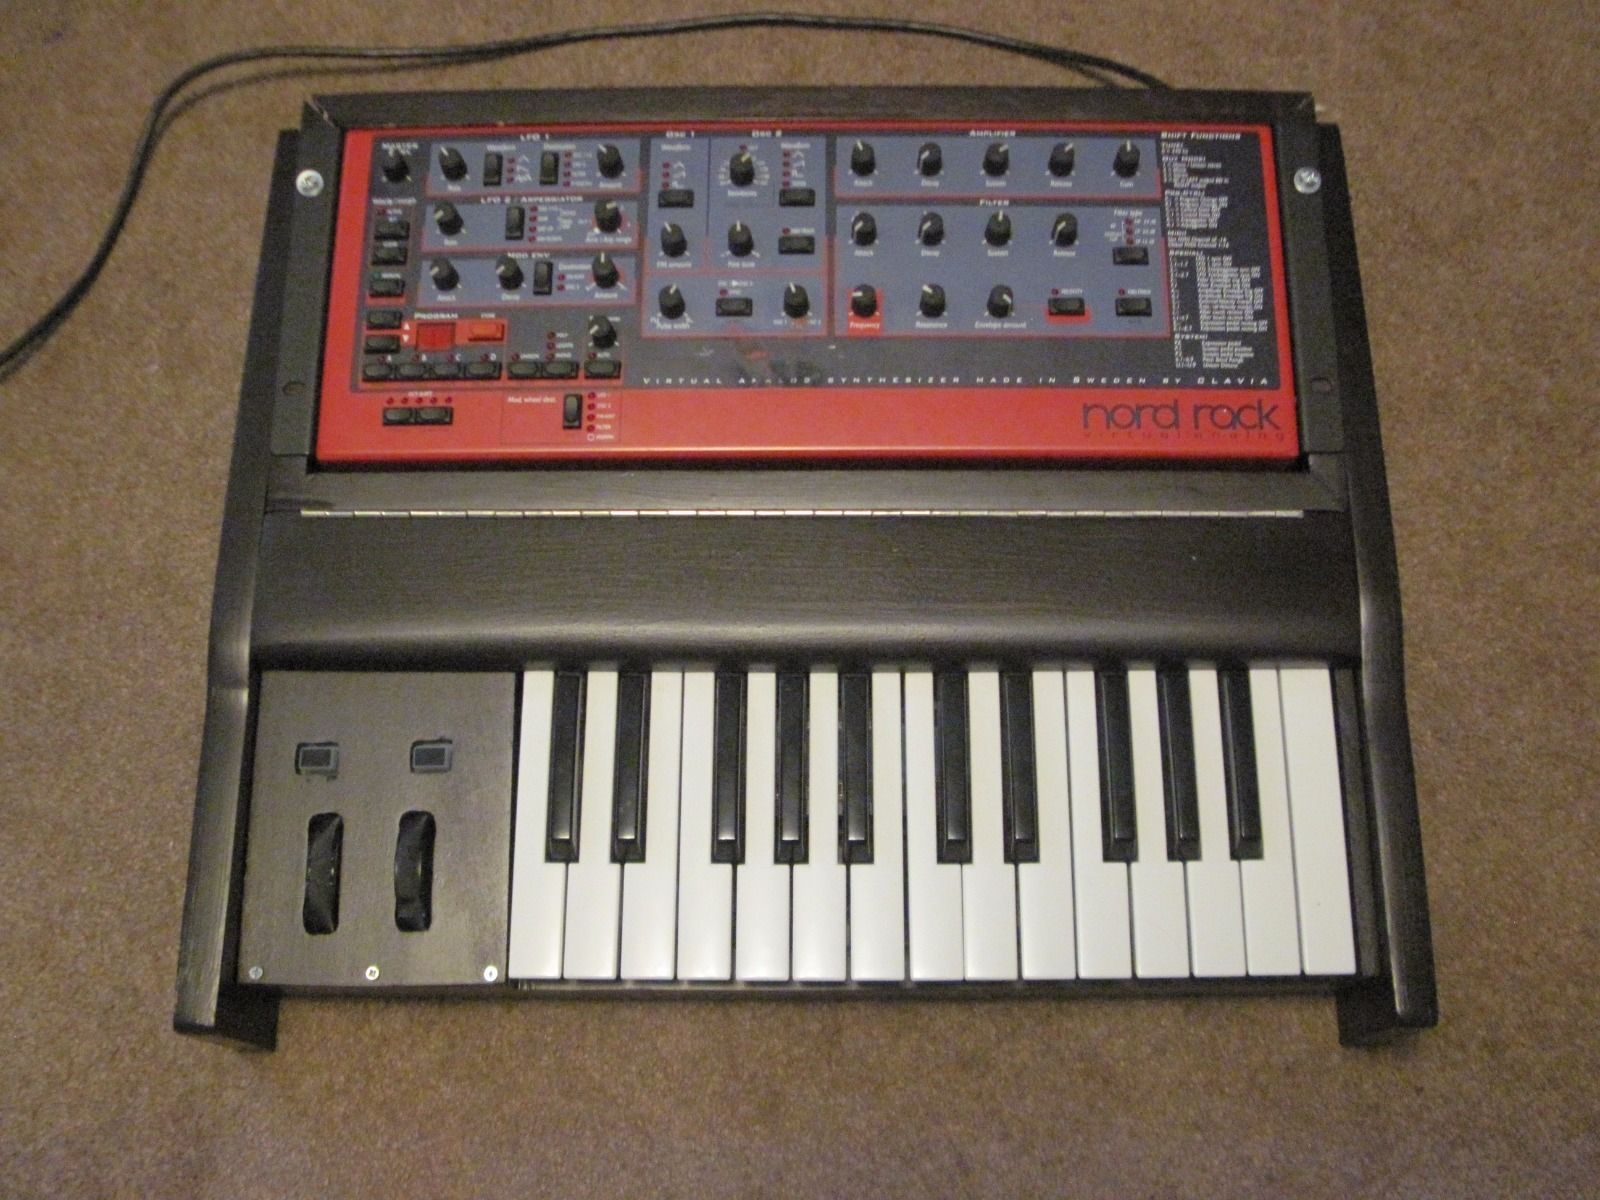 matrixsynth custom wood midi keyboard 25 key 4u rackmount case. Black Bedroom Furniture Sets. Home Design Ideas